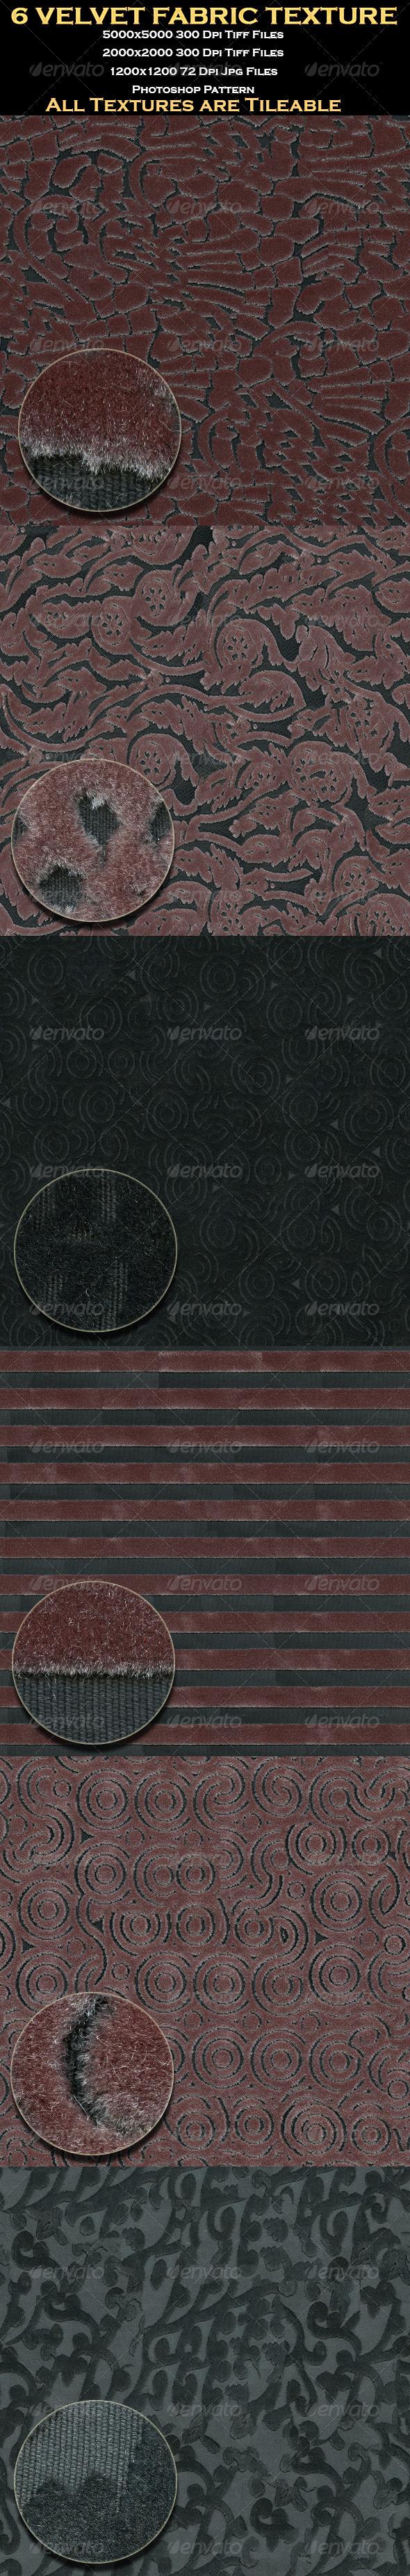 GraphicRiver 6 Velvet Fabric Texture 4655109